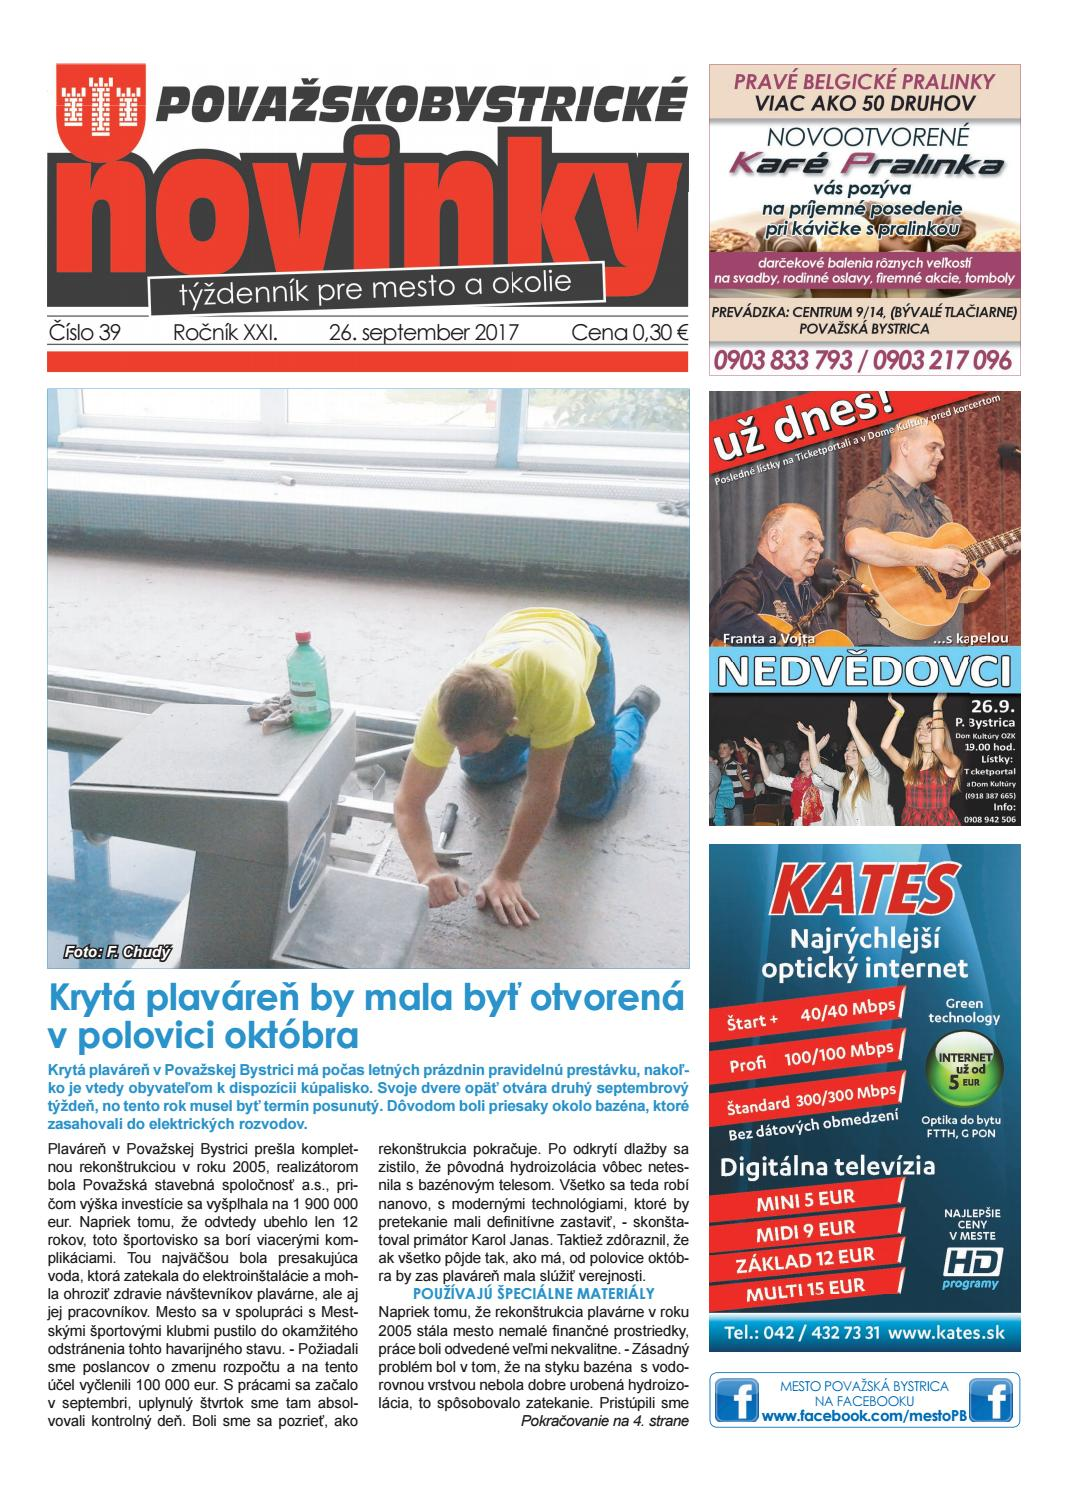 Považskobystrické novinky č. 39 2017 by Považskobystrické novinky - issuu 5f3f8e44cfc